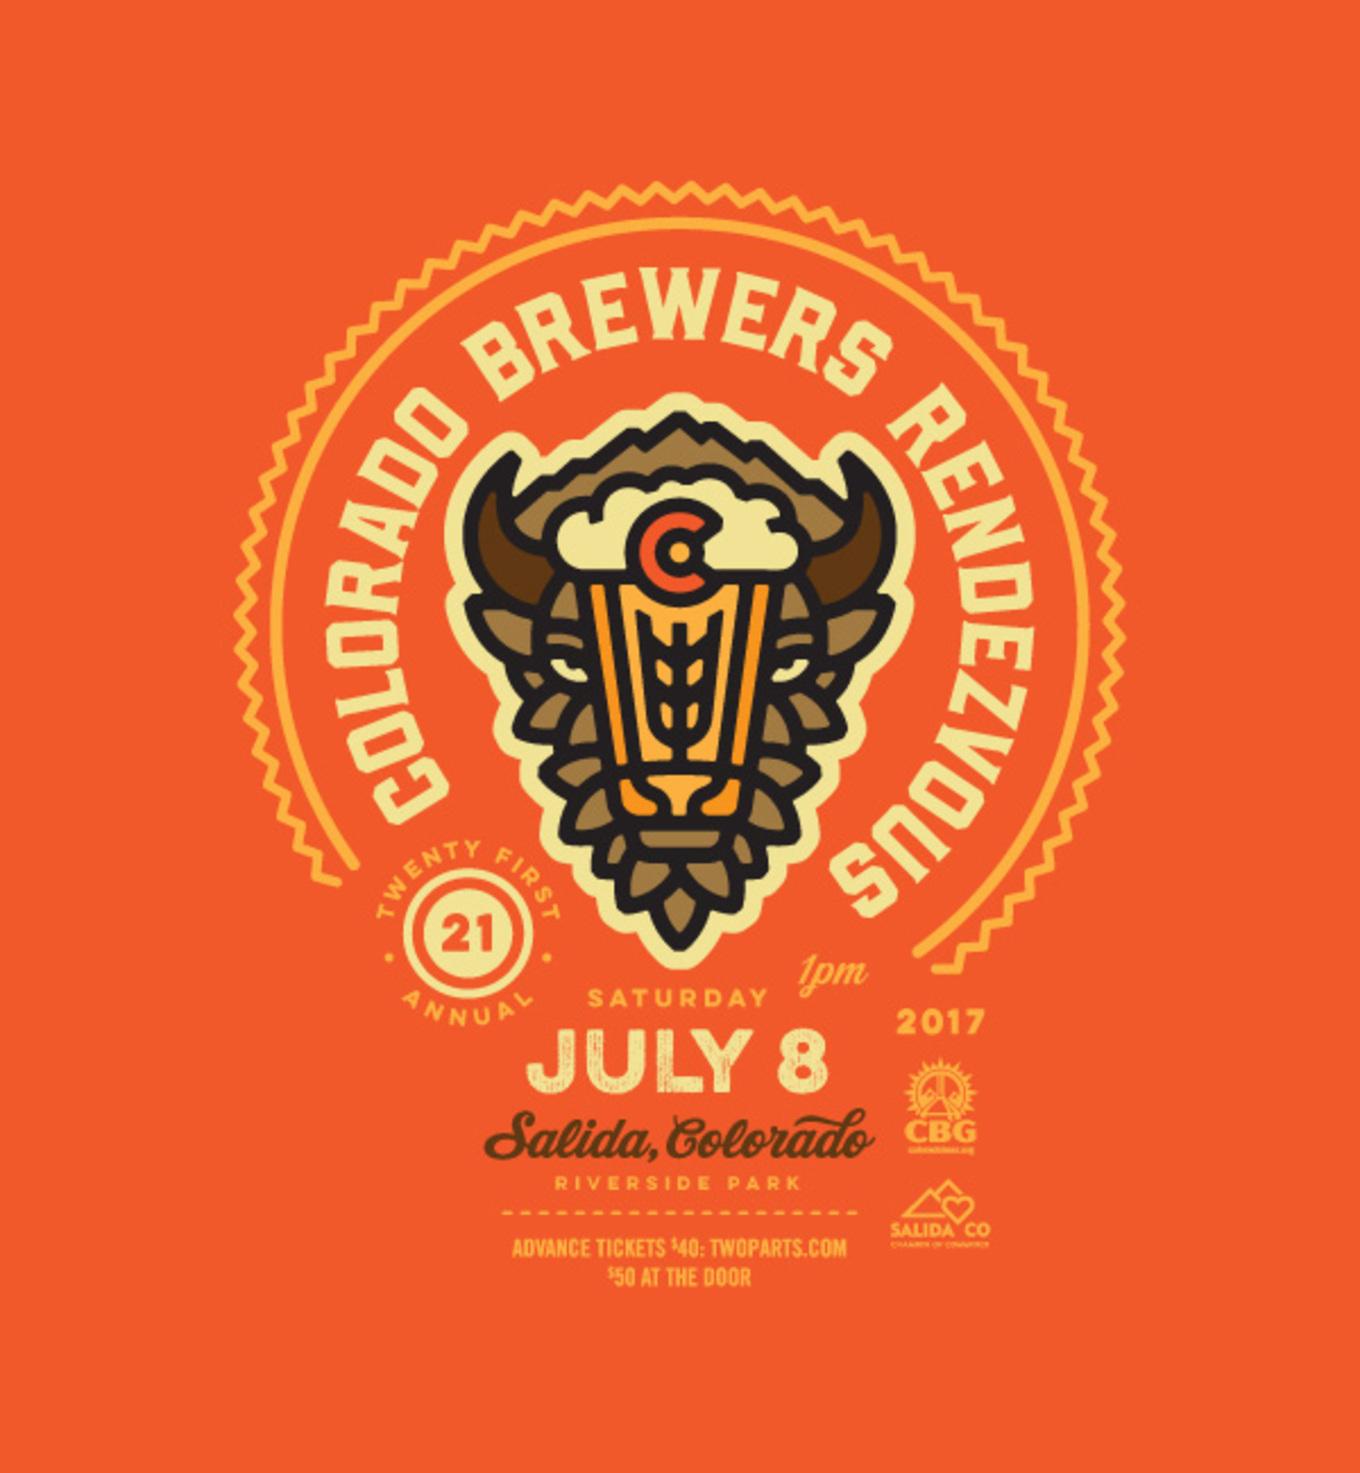 Colorado Brewers Guild Celebrates 21st Annual Colorado